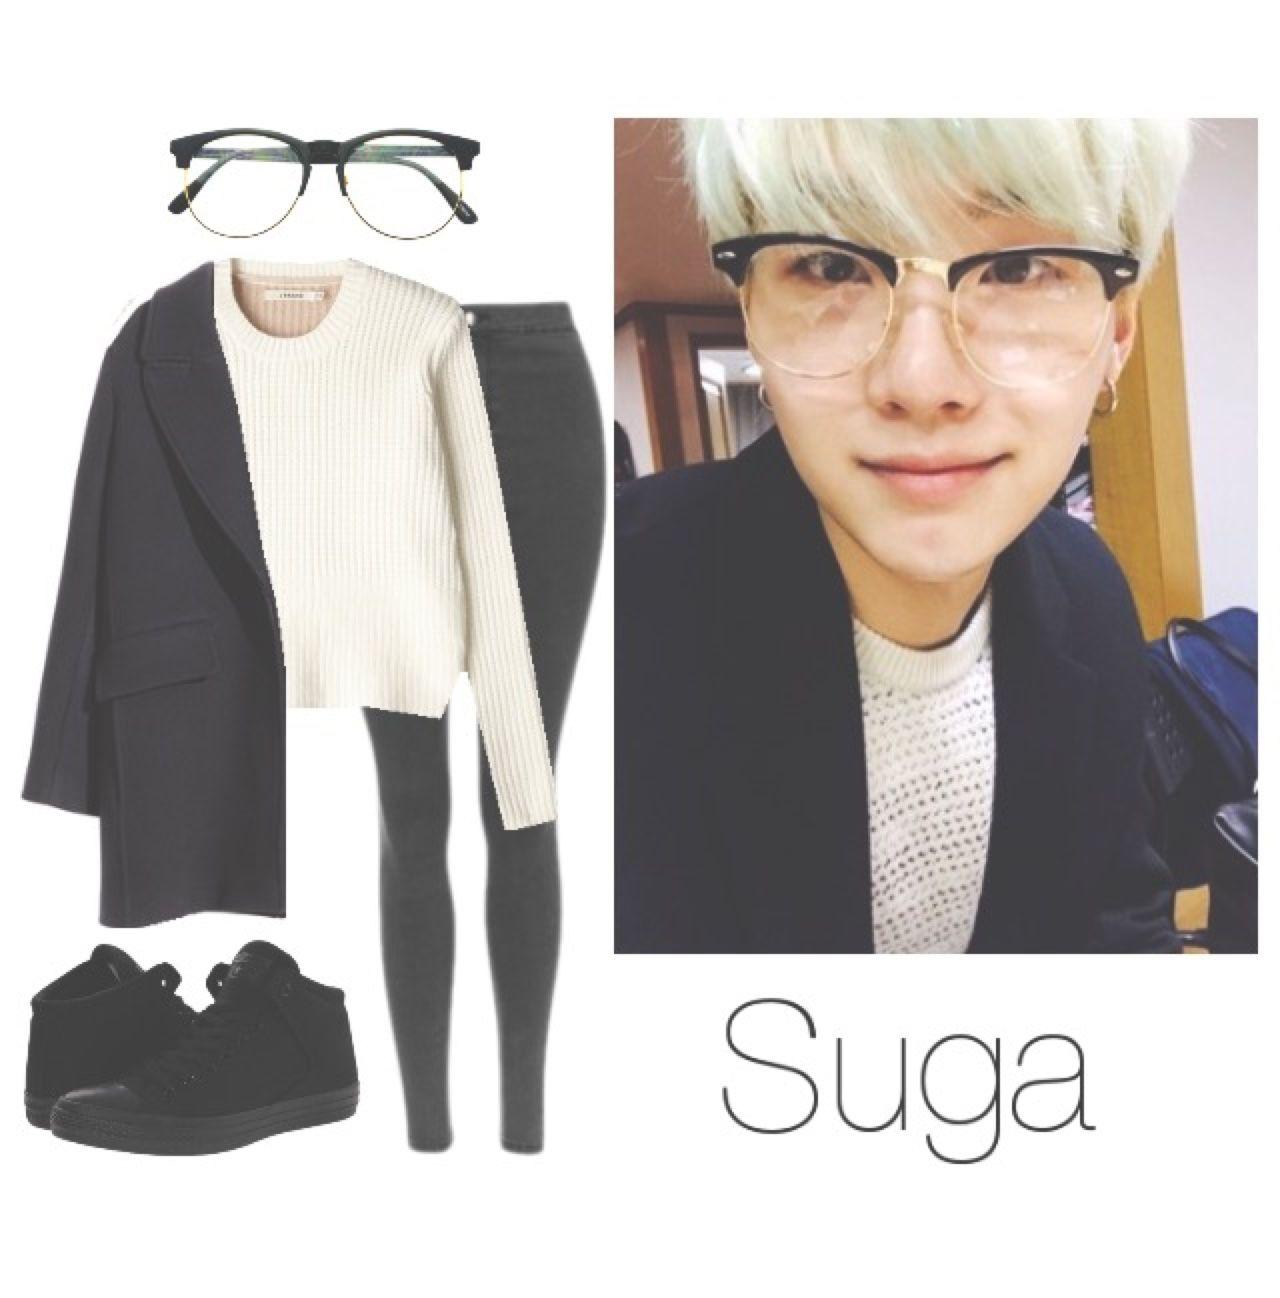 BTS Suga/Yoongi Selca insp. Outfit @BTSOufits | BTS outfits | Pinterest | Bts suga BTS and Kpop